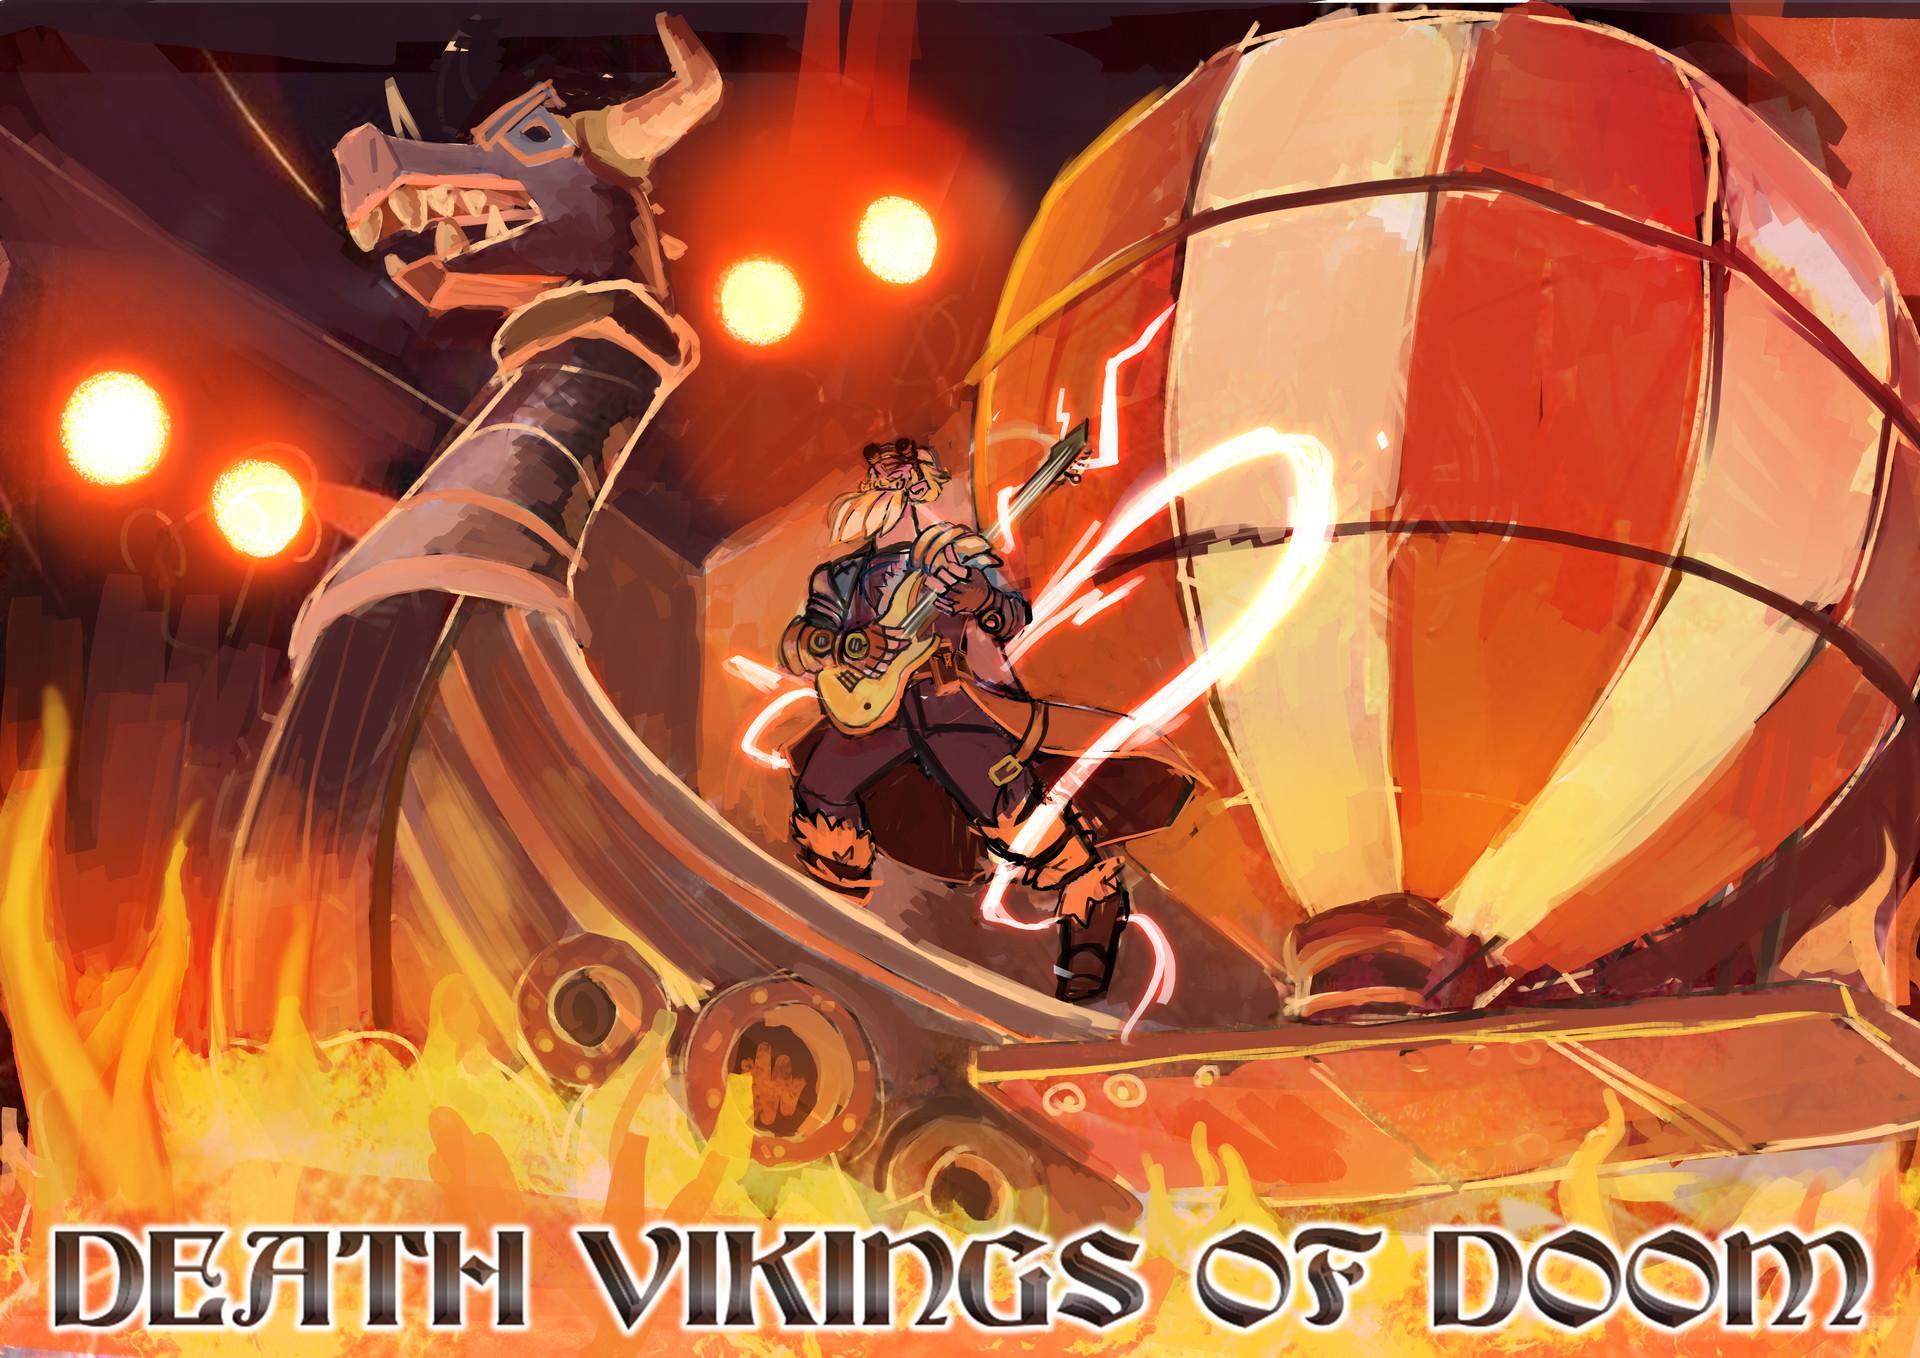 Nickie villa groupe de heavy metal viking steampunk